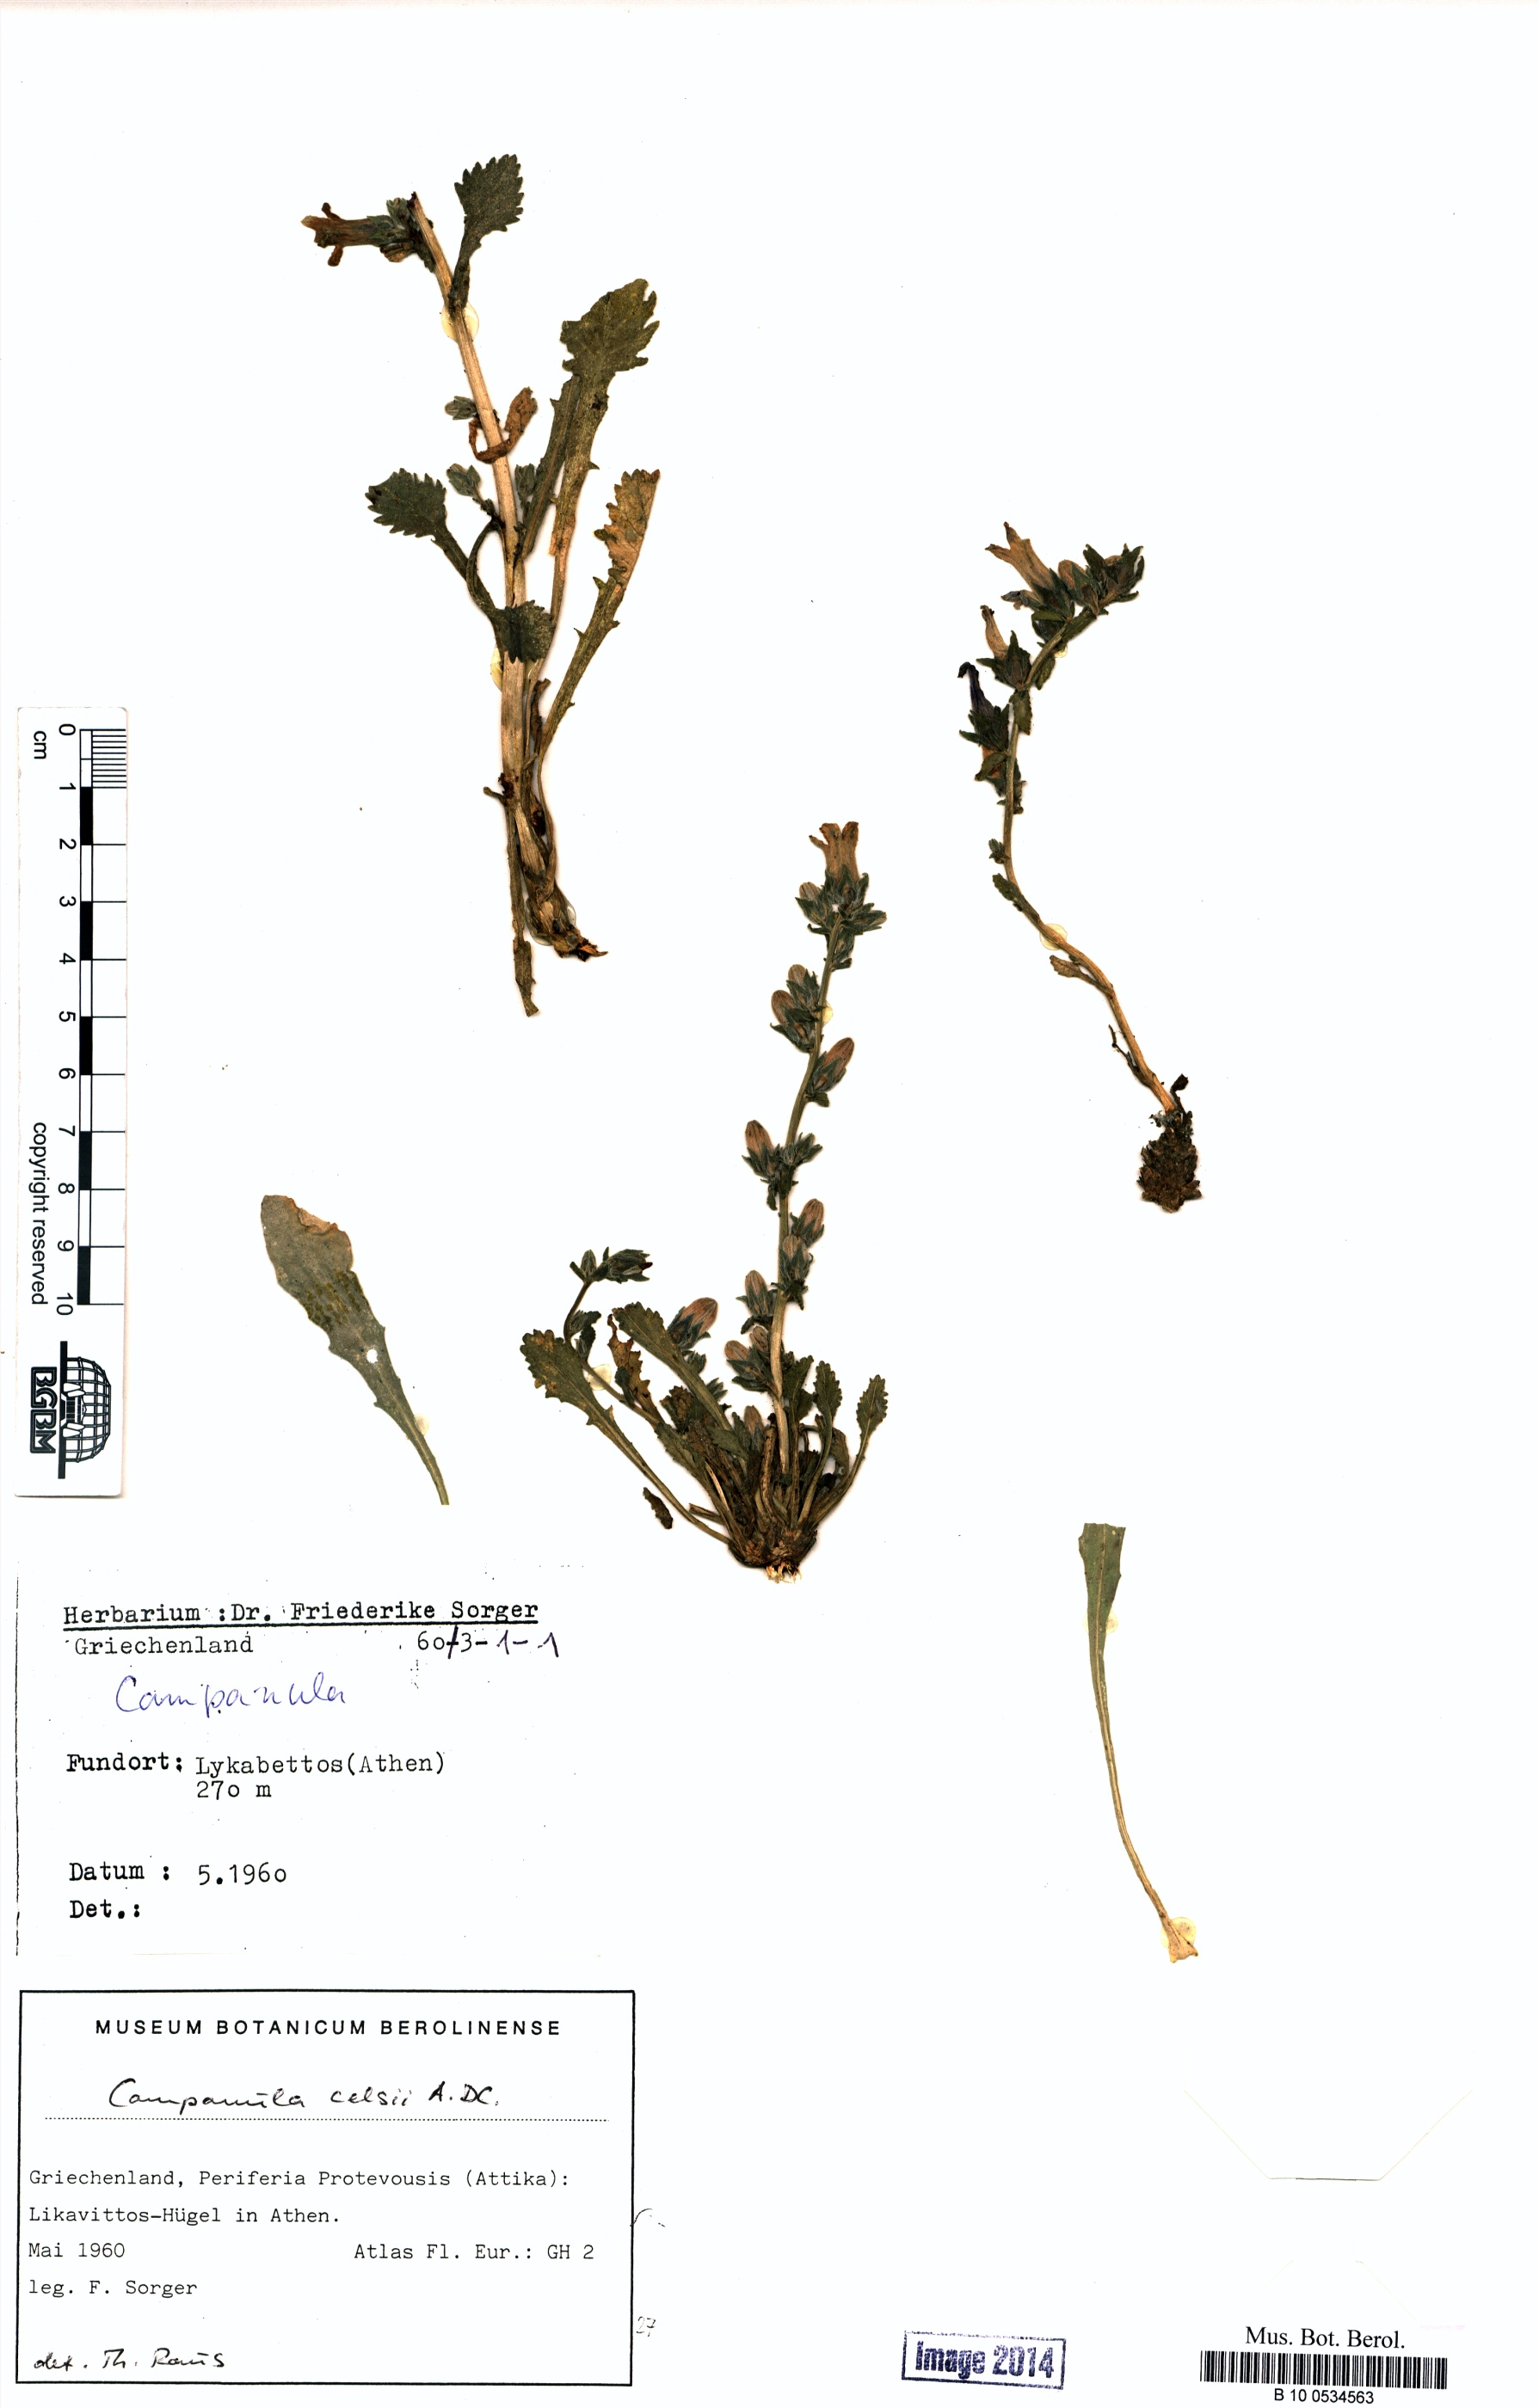 http://ww2.bgbm.org/herbarium/images/B/10/05/34/56/B_10_0534563.jpg